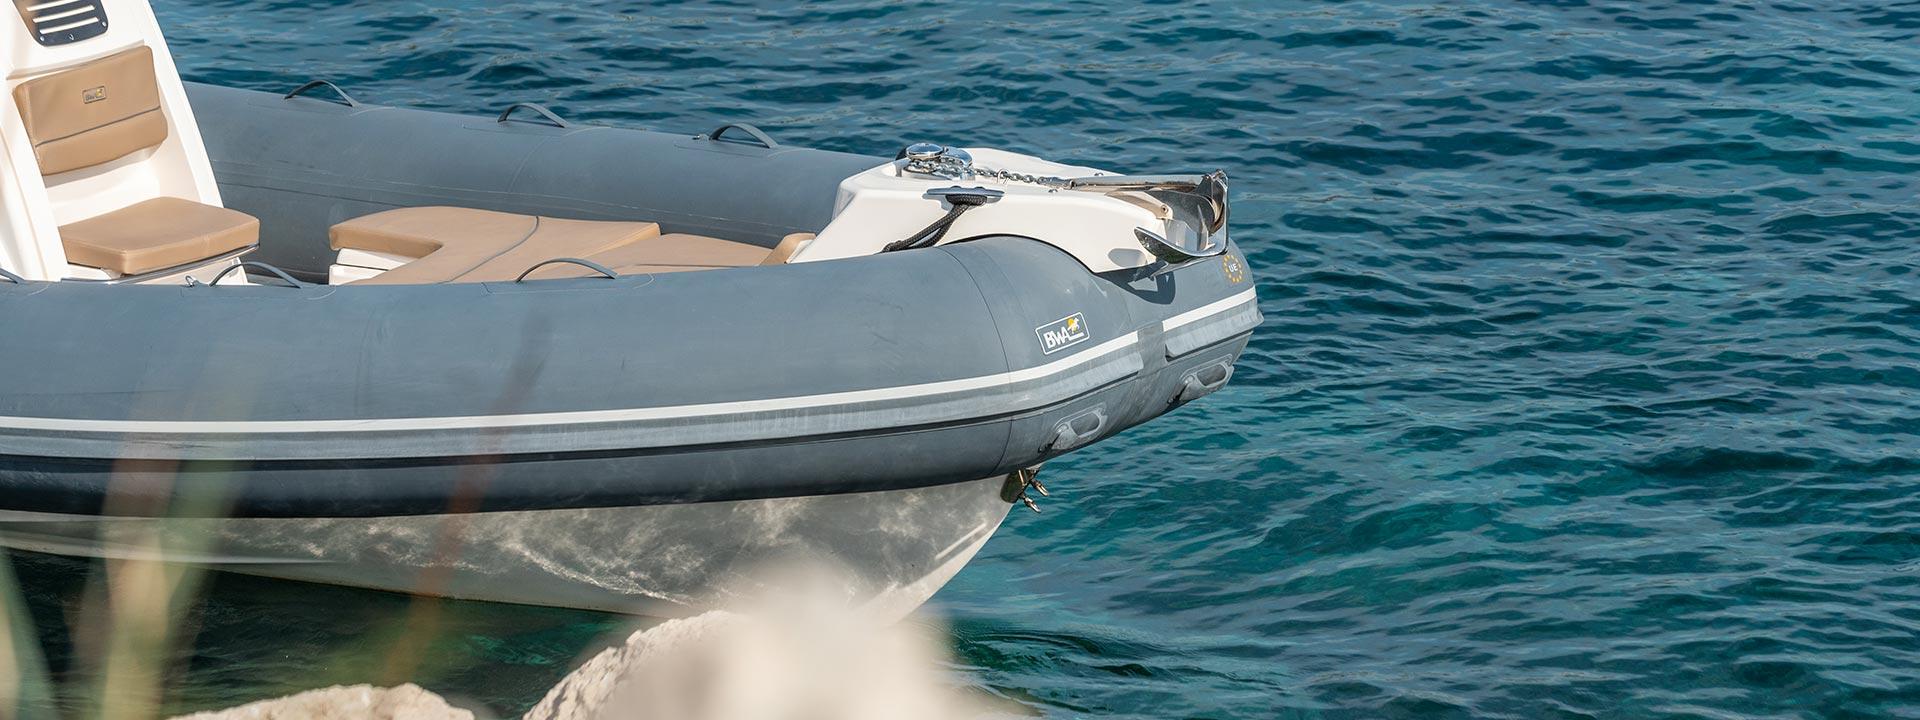 mayer-charter-boat-header-bwa-gto-sport-26-07